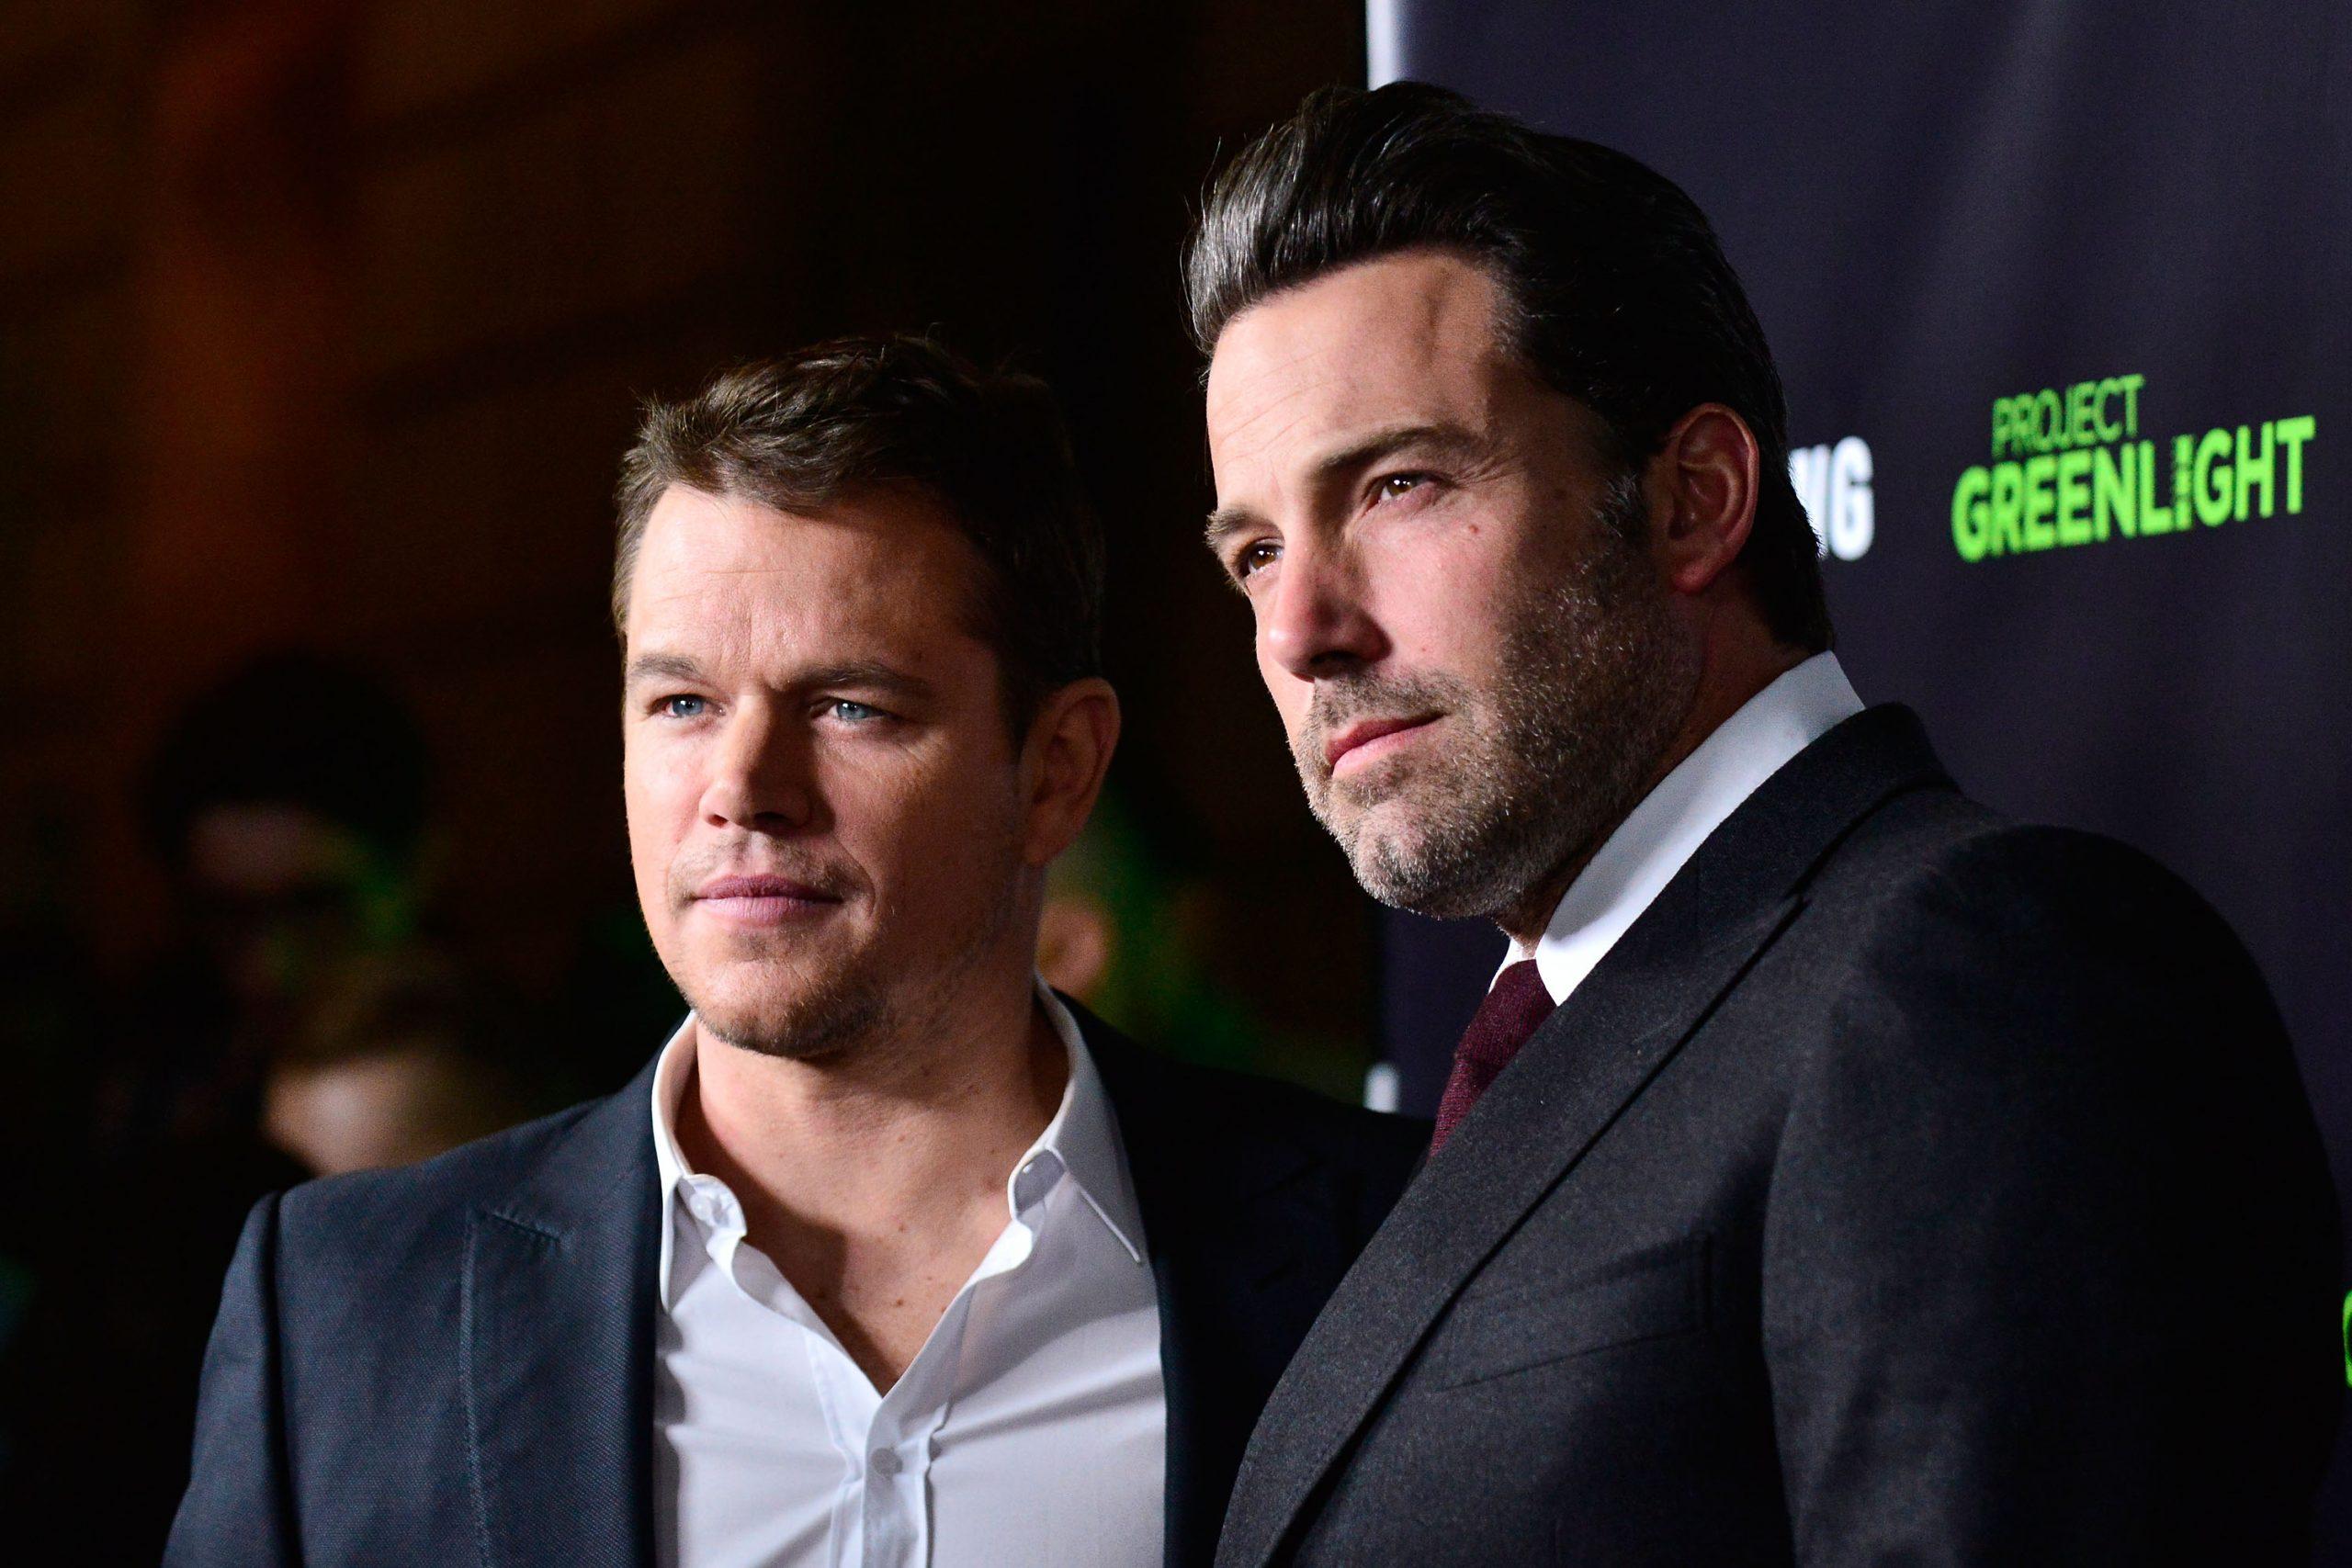 Ben Affleck Says Matt Damon's Helped His 'Sanity and Mental Health'